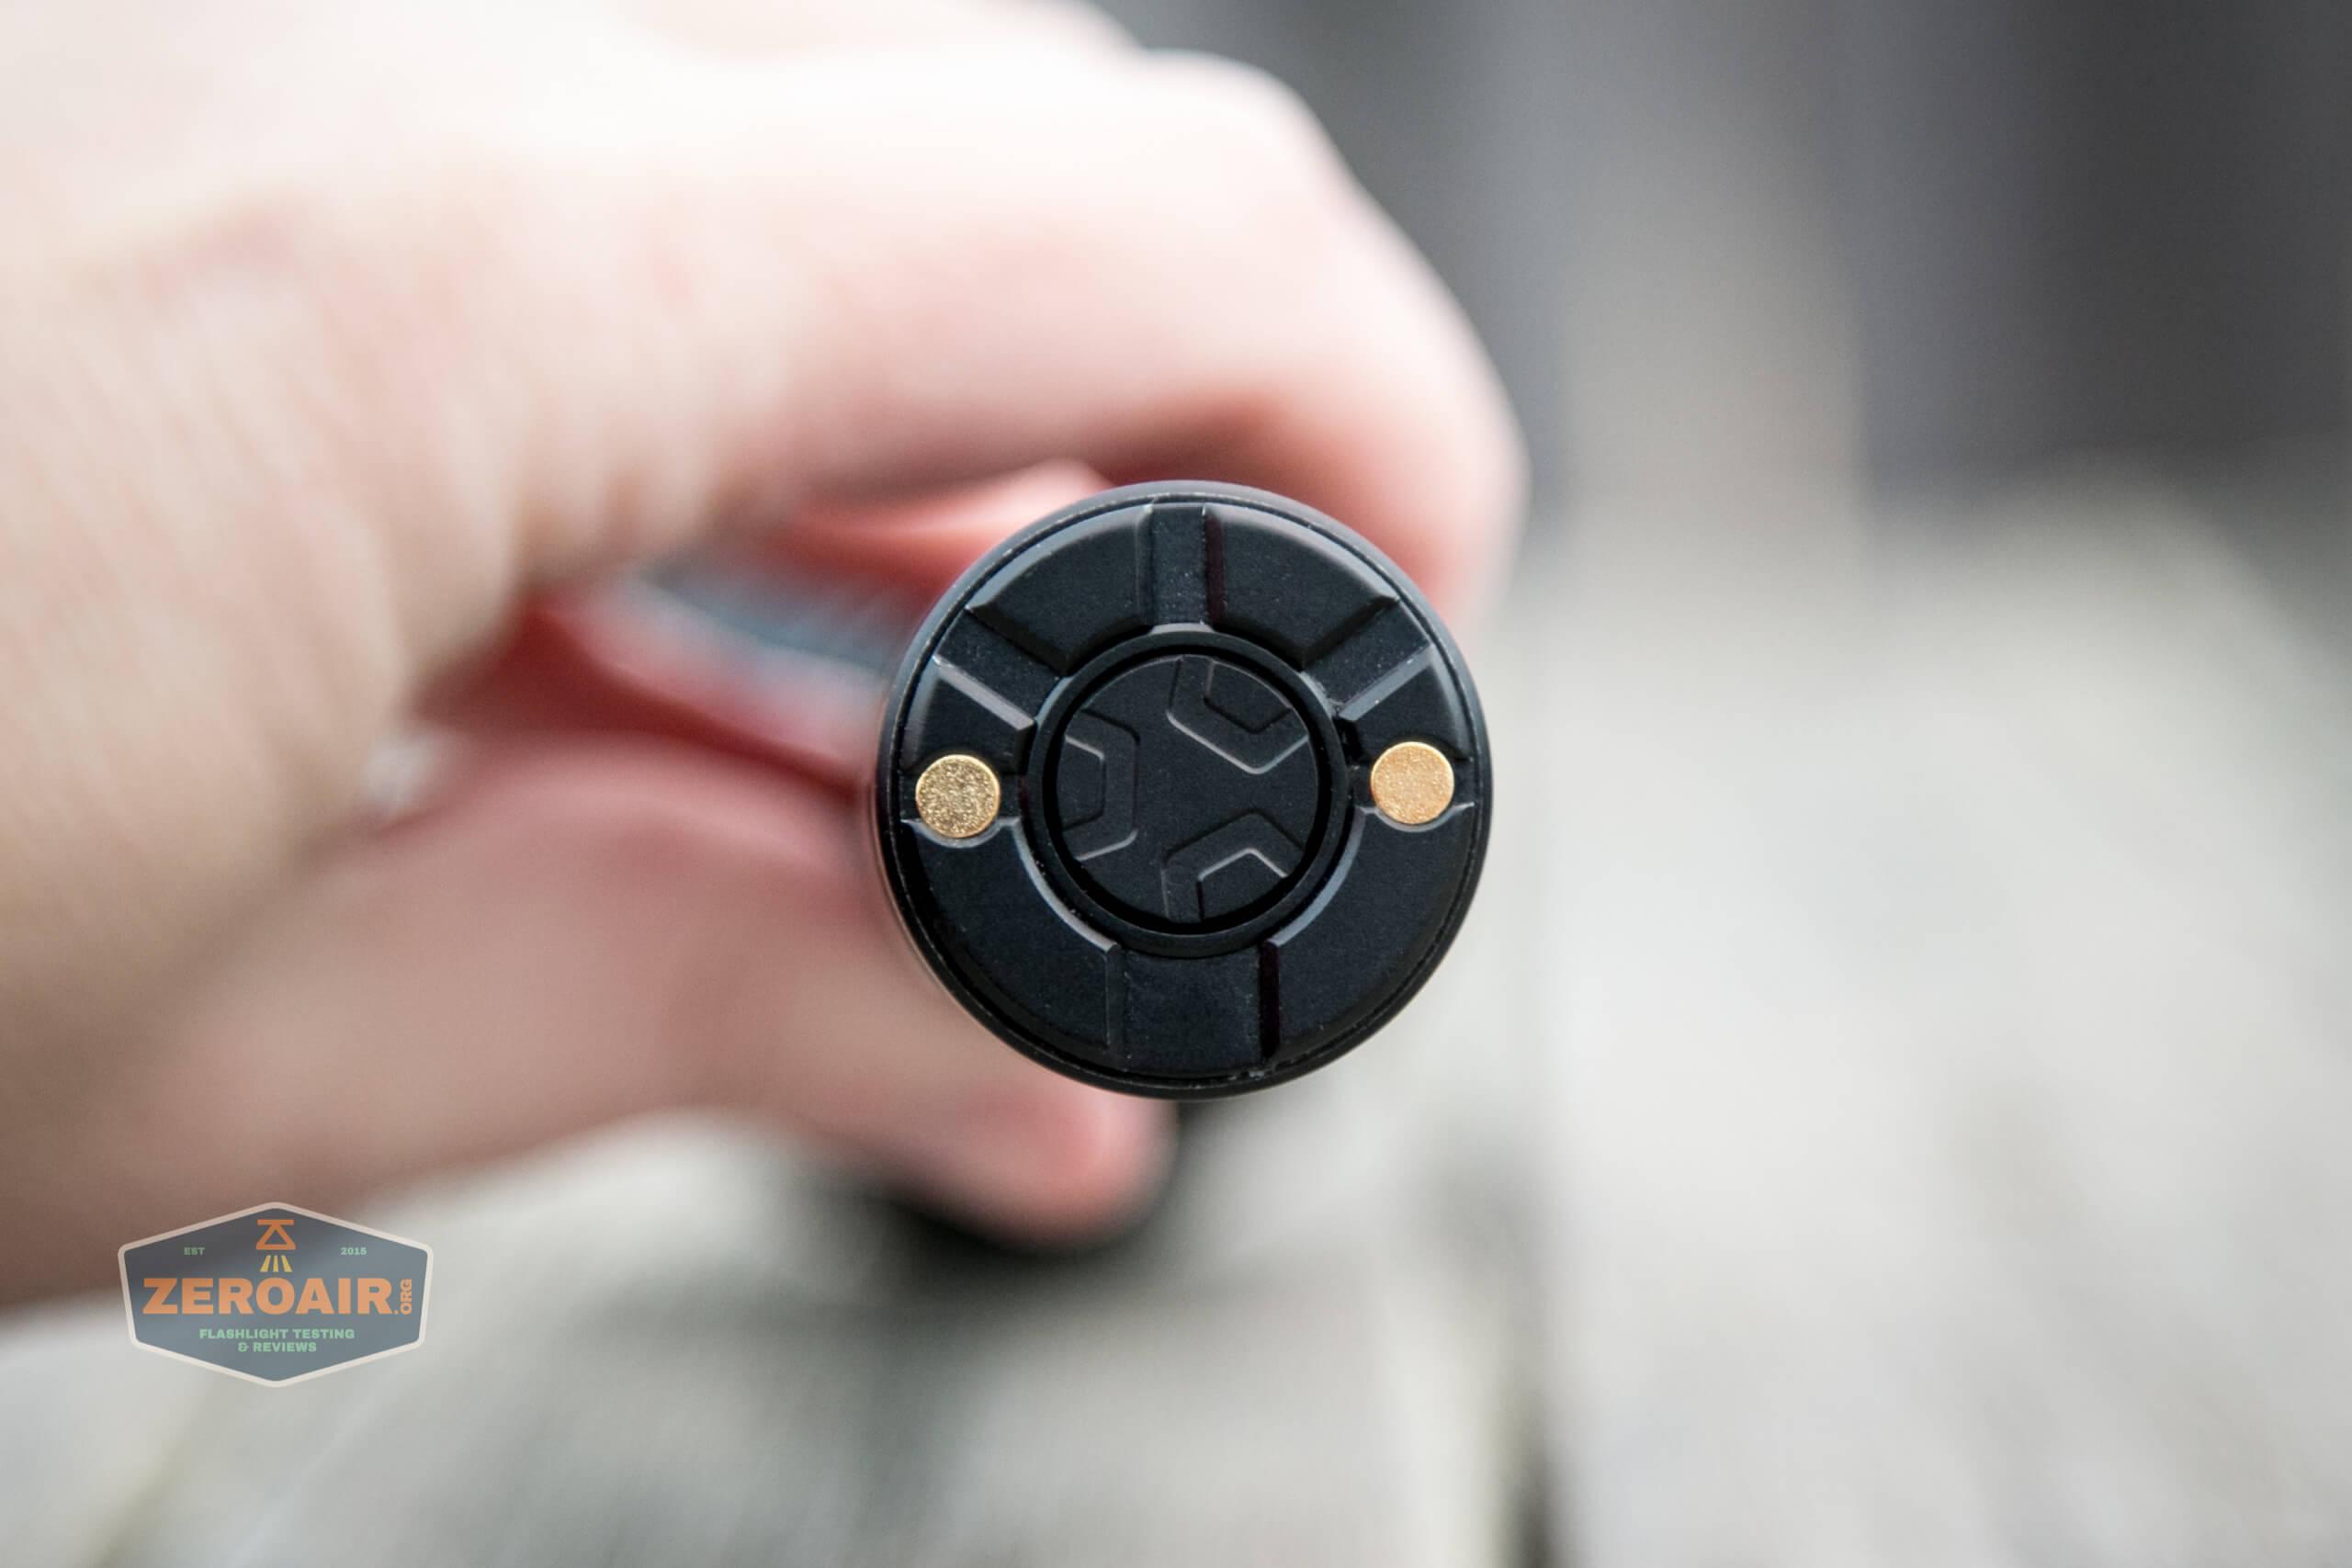 imalent ut90 keyed tailcap